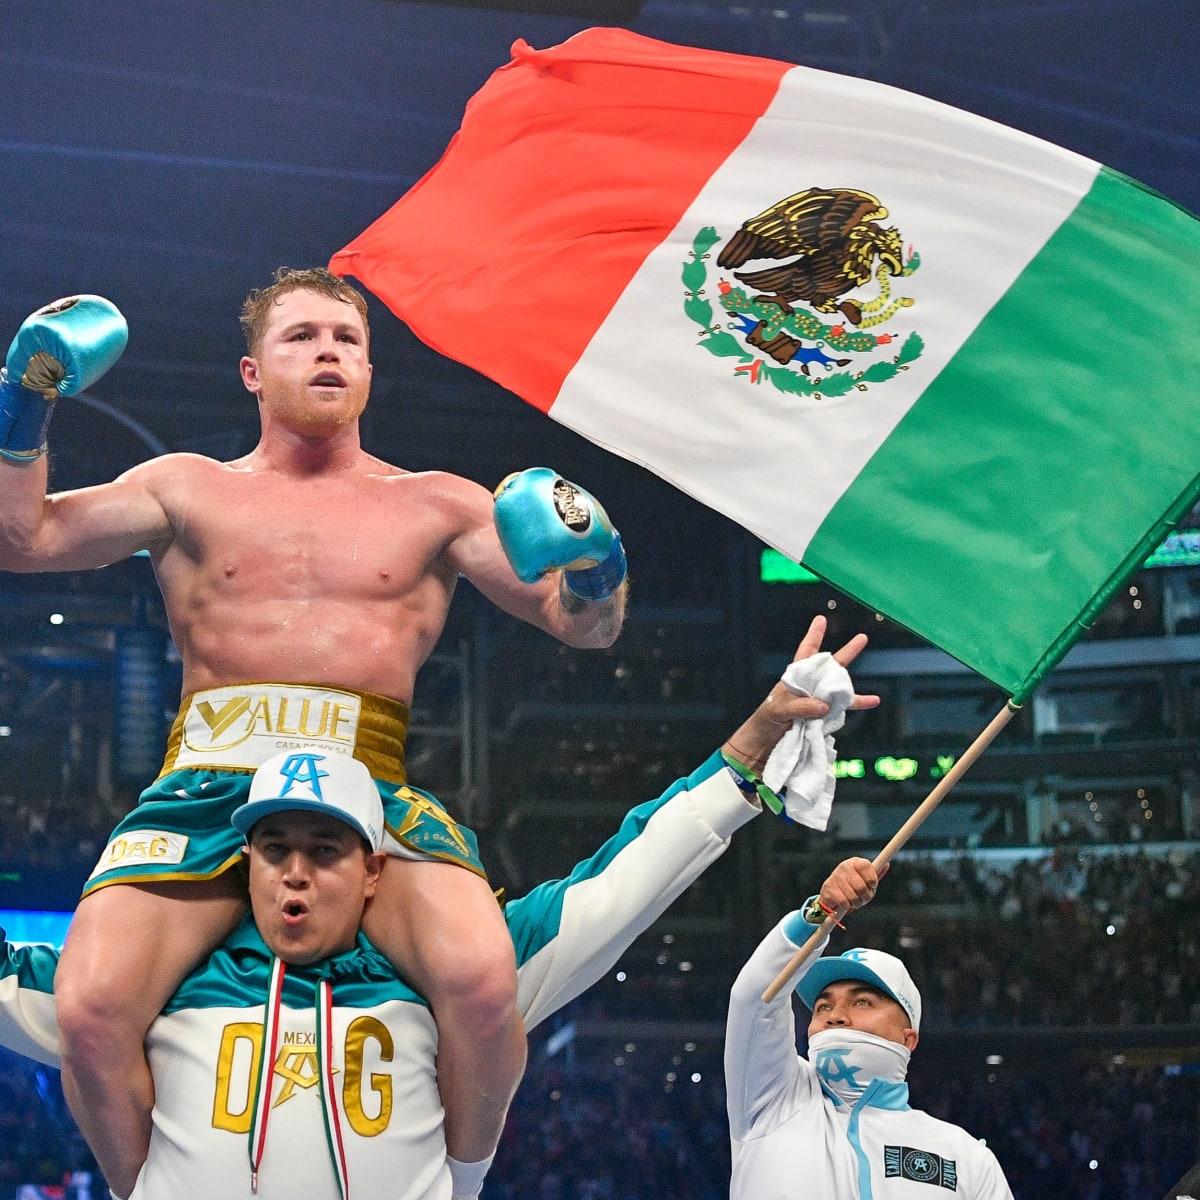 Canelo Alvarez beats Billy Joe Saunders: What's next? - Sports Illustrated